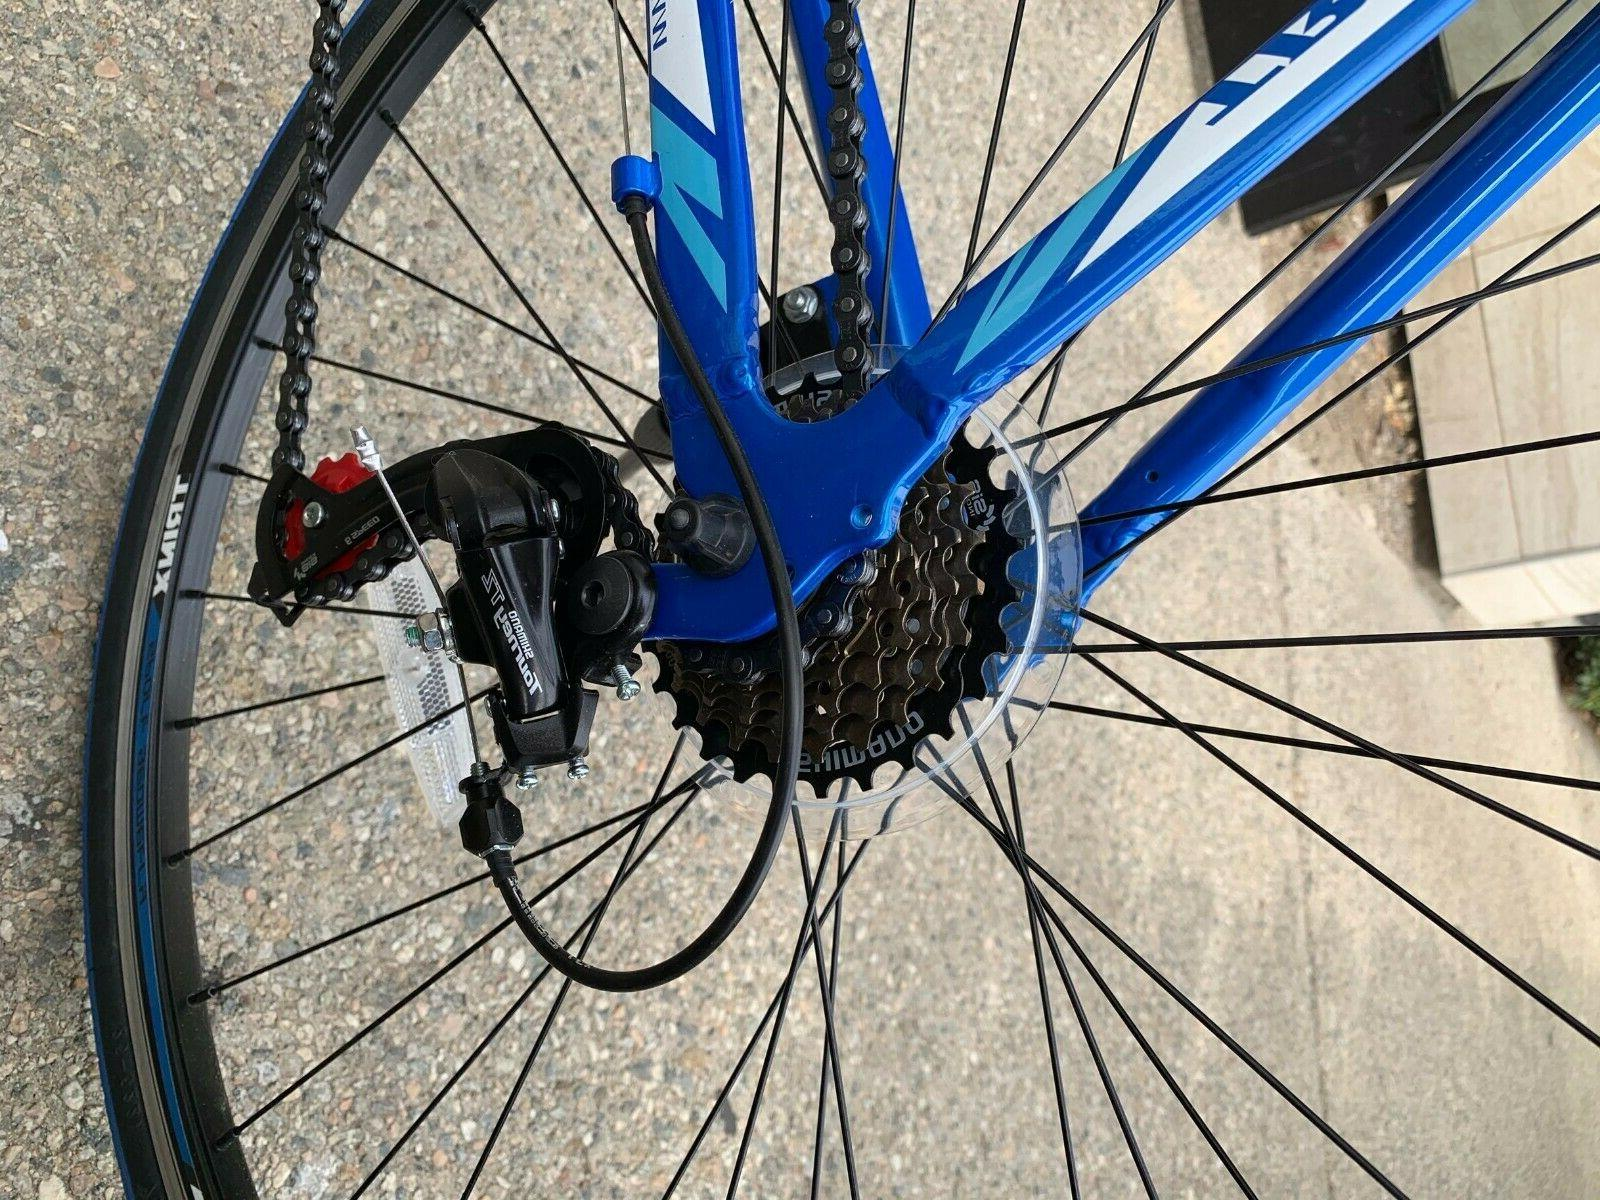 Trinx Bike Shimano Racing Bicycle NEW